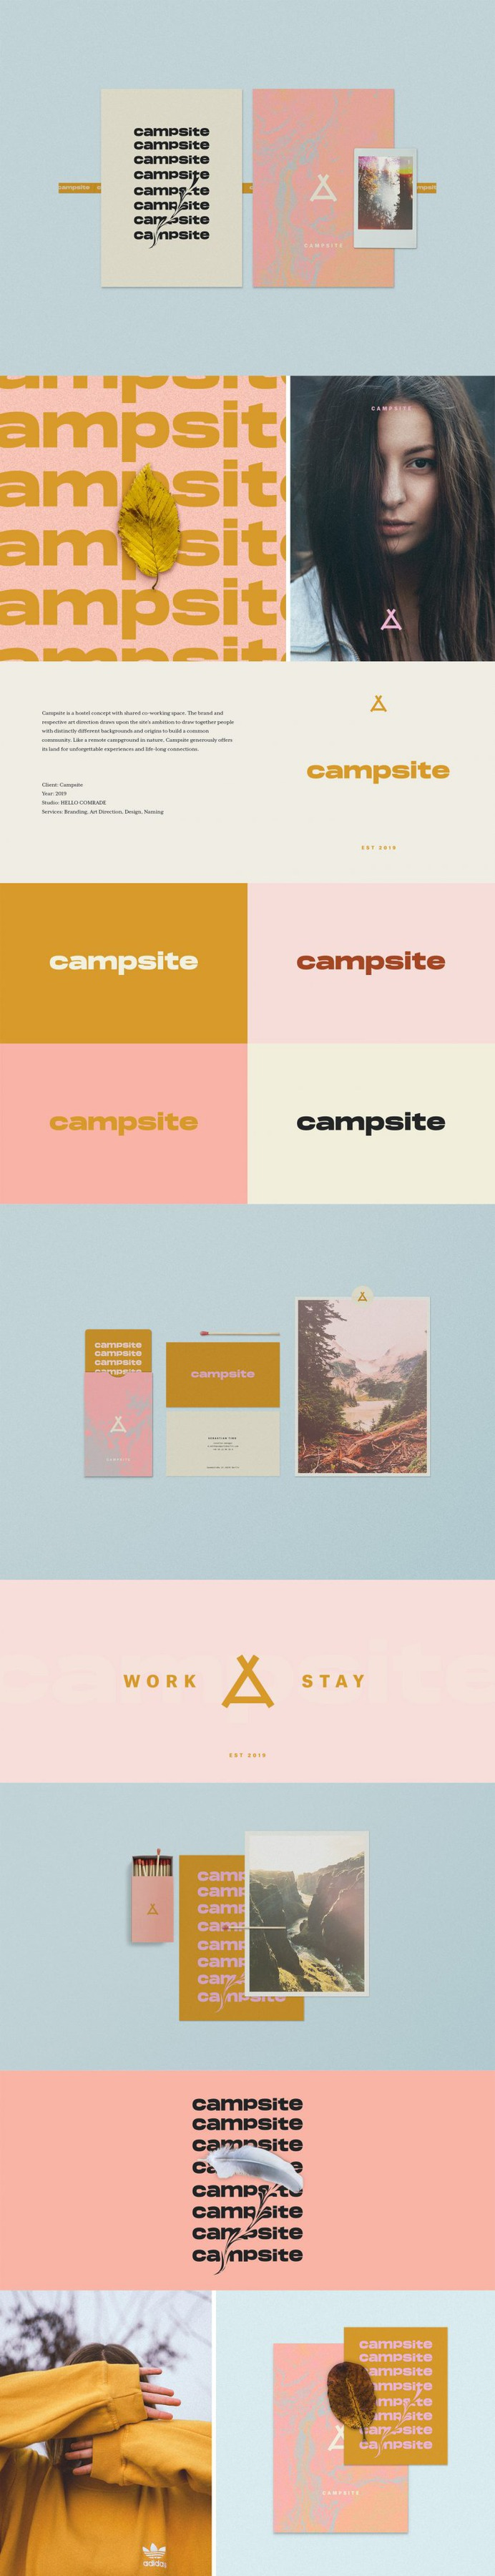 Campsite | Brand Identity